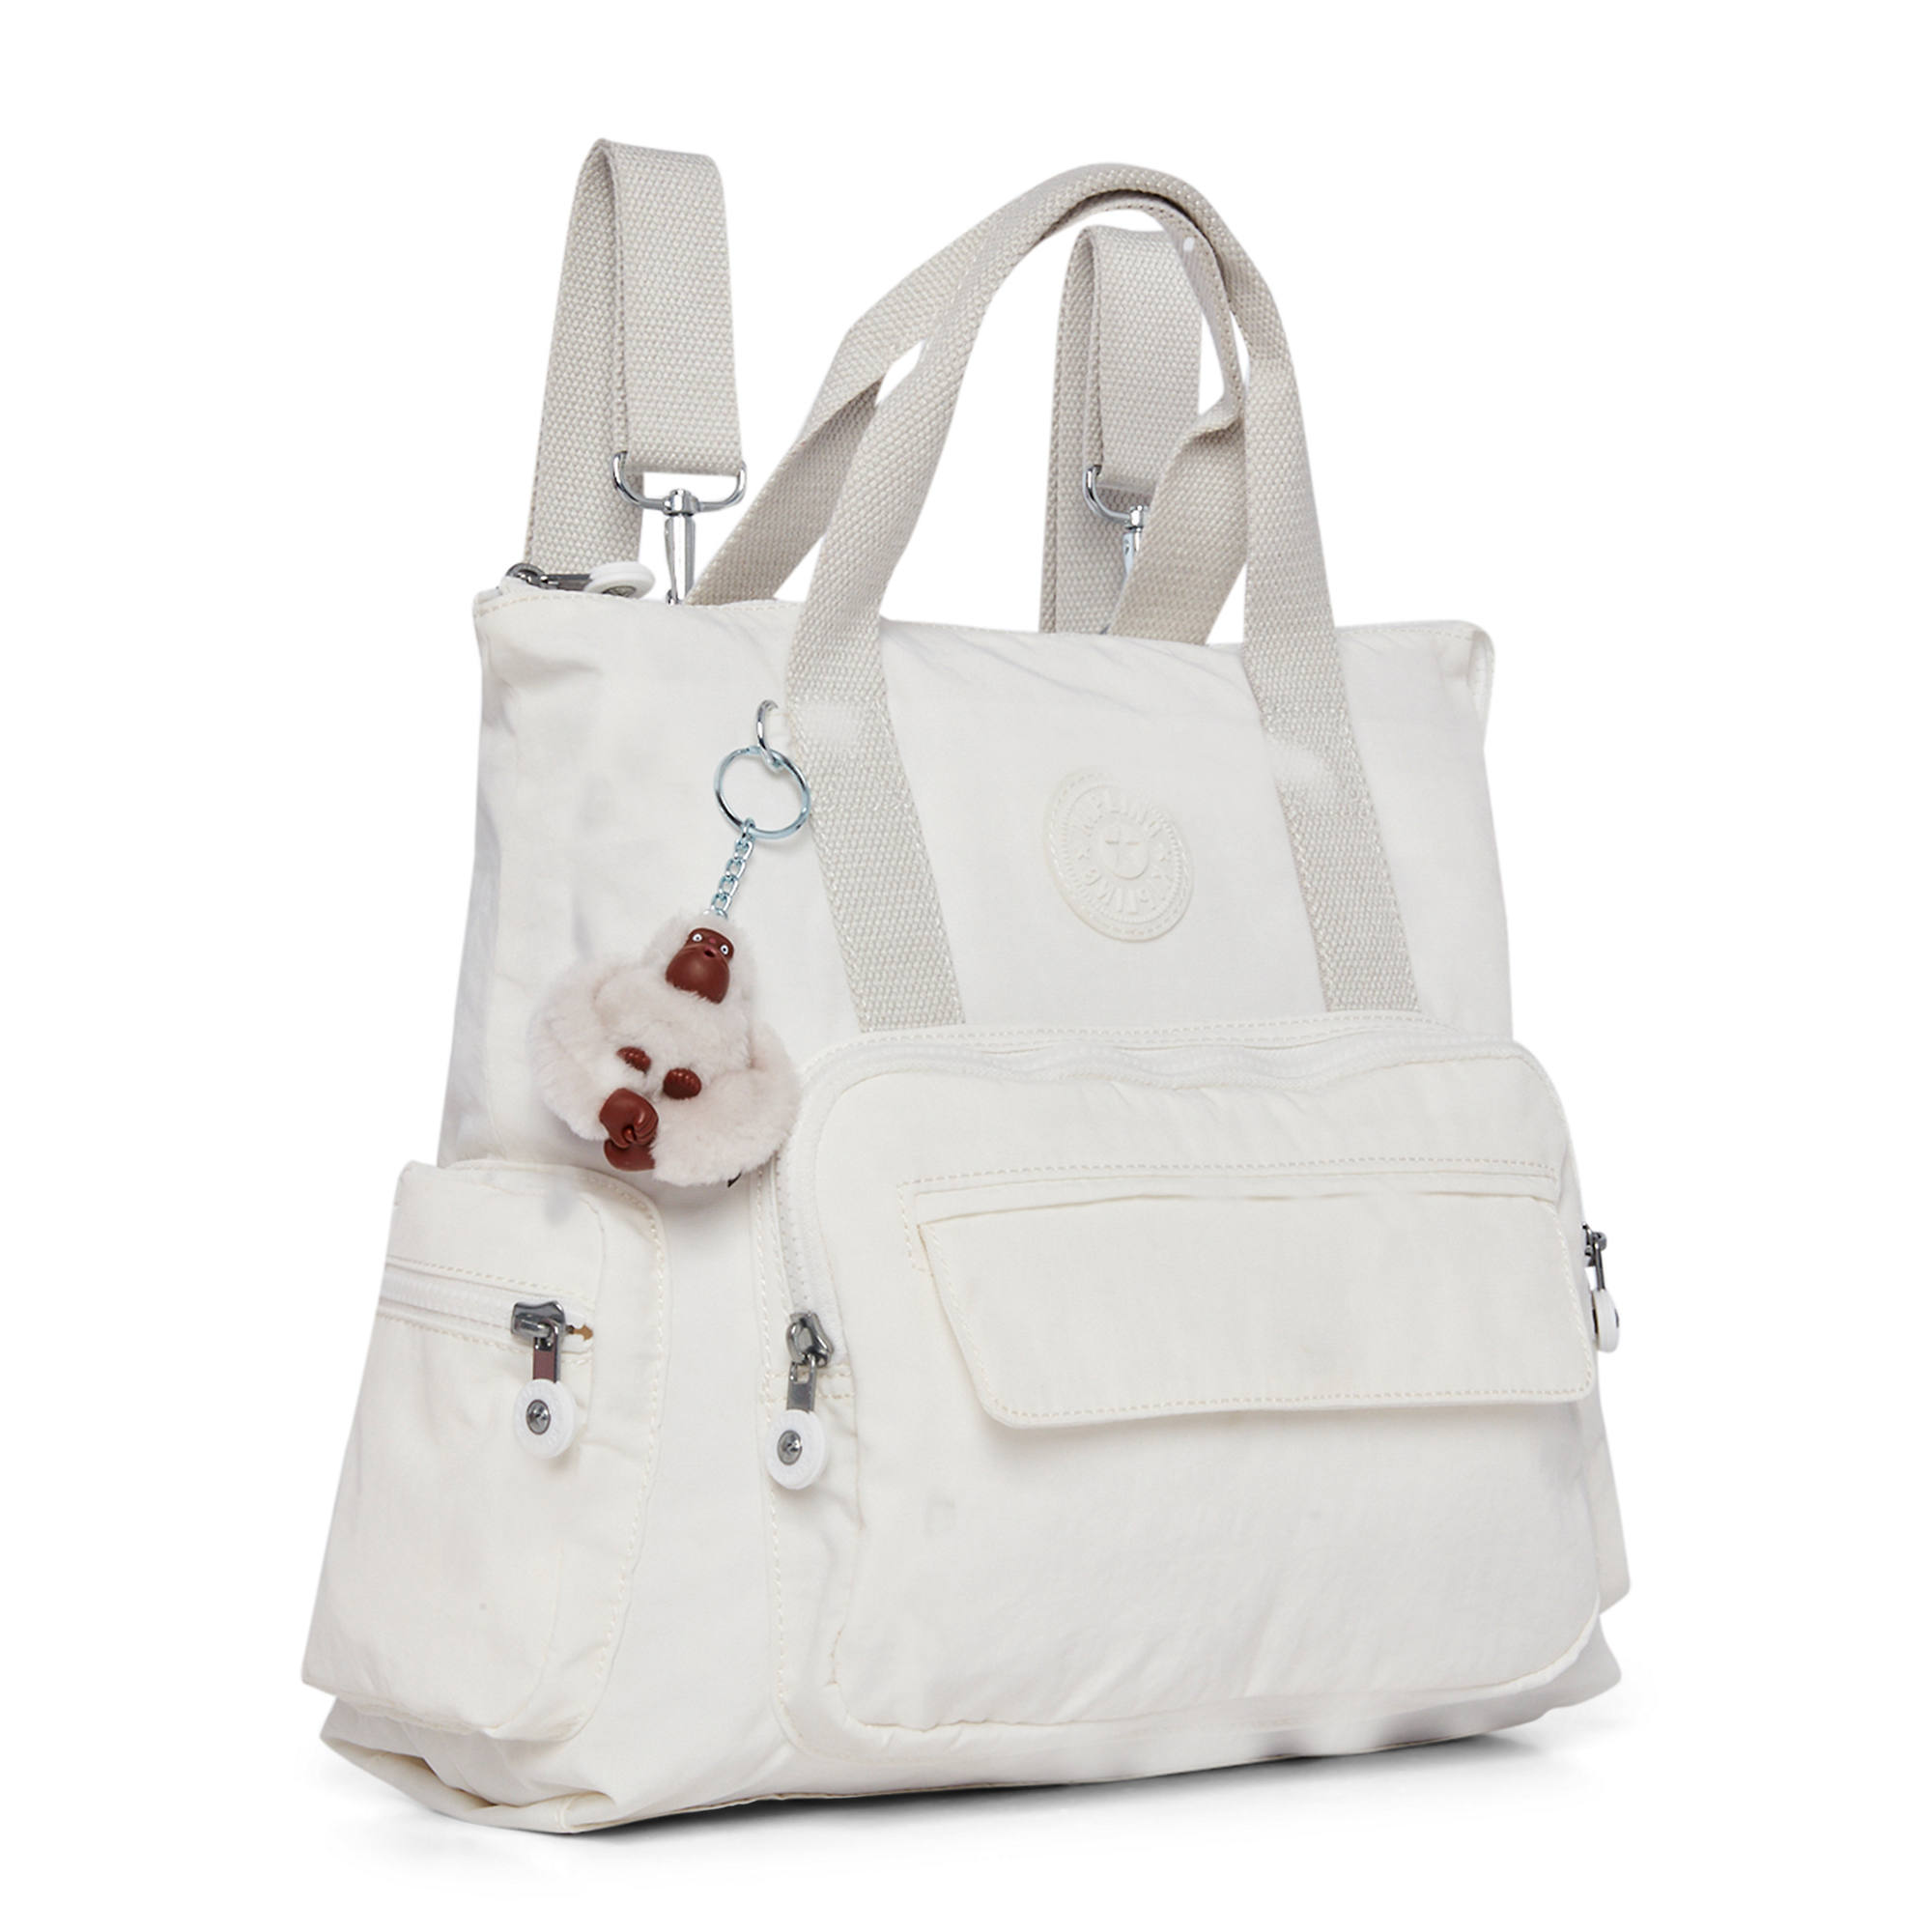 Kipling-Alvy-2-In-1-Convertible-Tote-Bag-Backpack miniatura 5